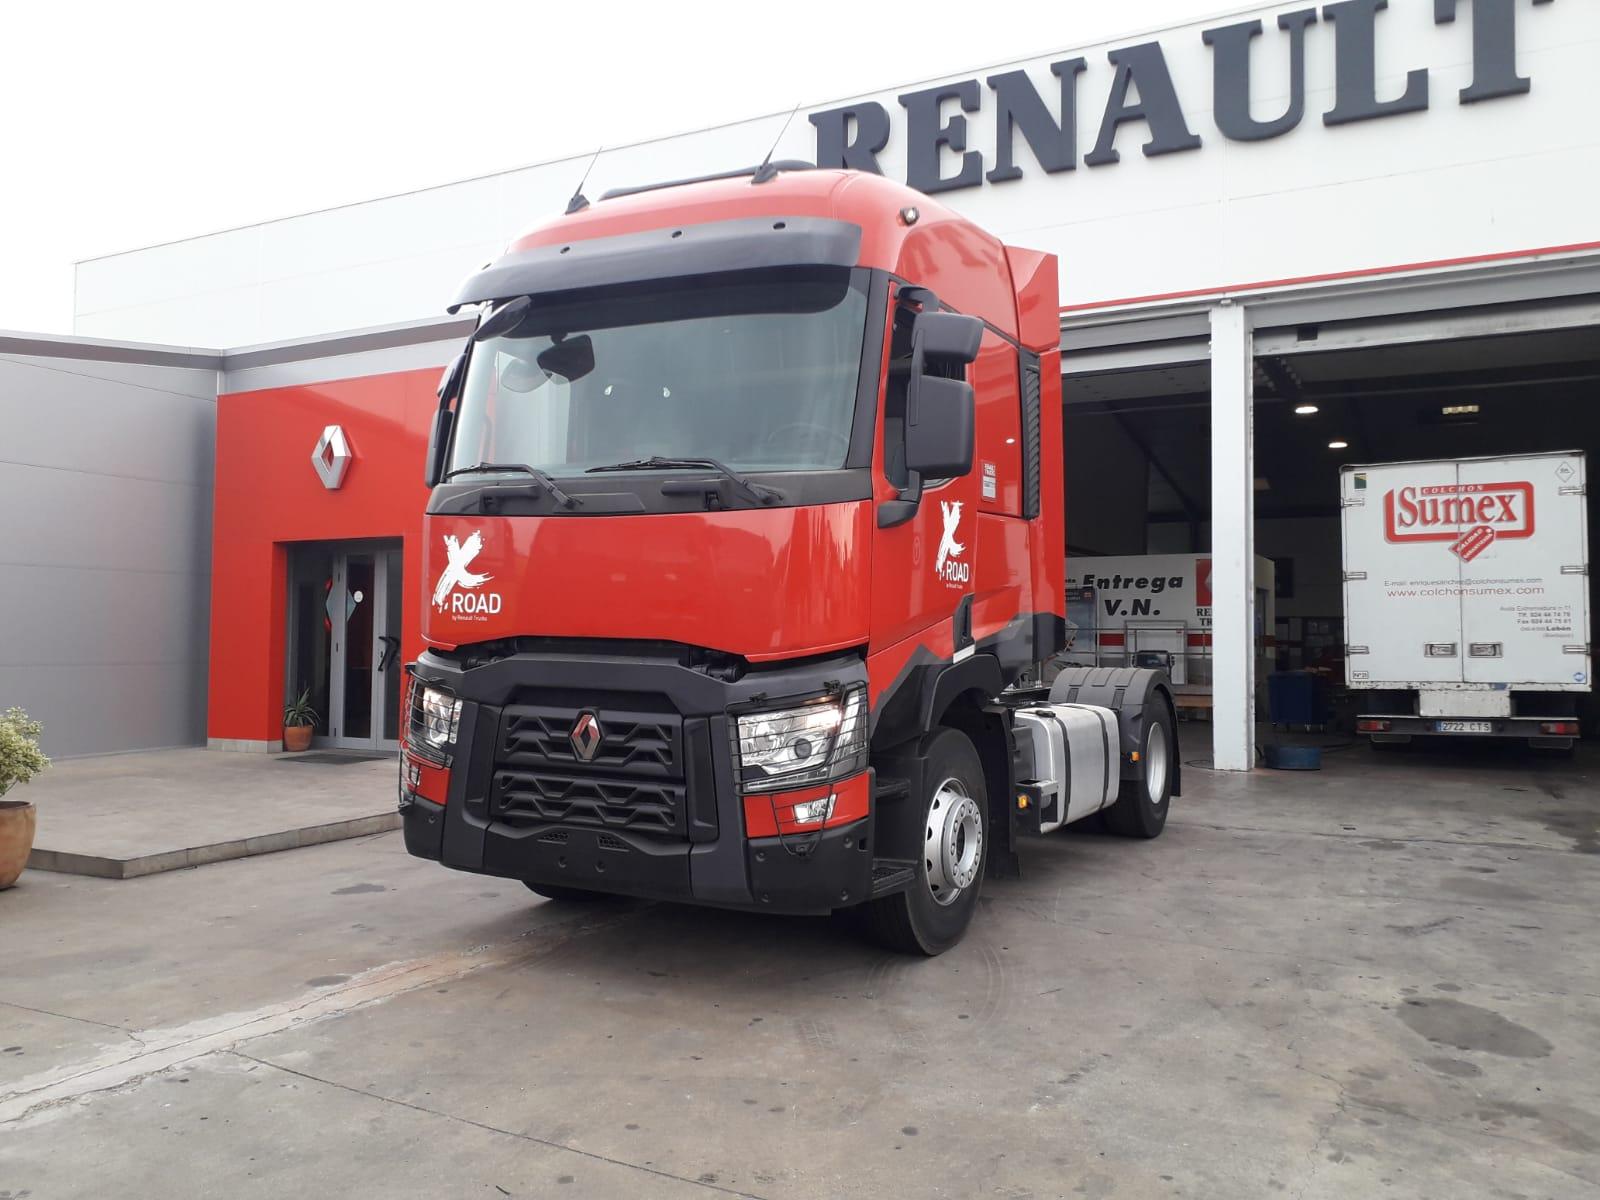 RENAULT T 460 T X-Road